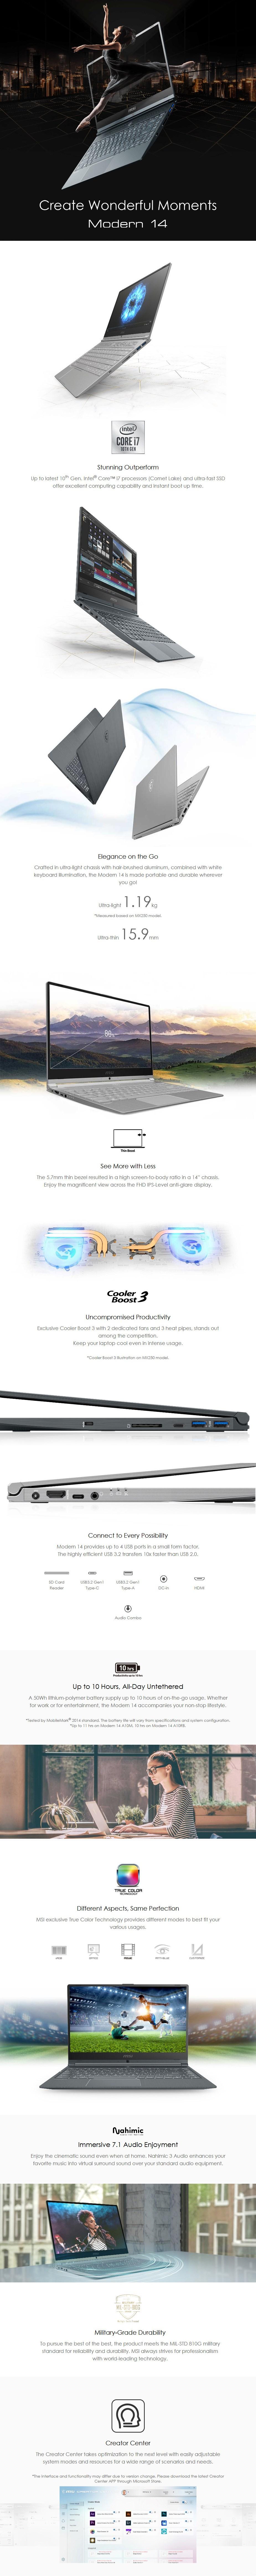 "MSI Modern 14 A10M 14"" Laptop i7-10510U 8GB 512GB W10H - Grey - Overview 1"